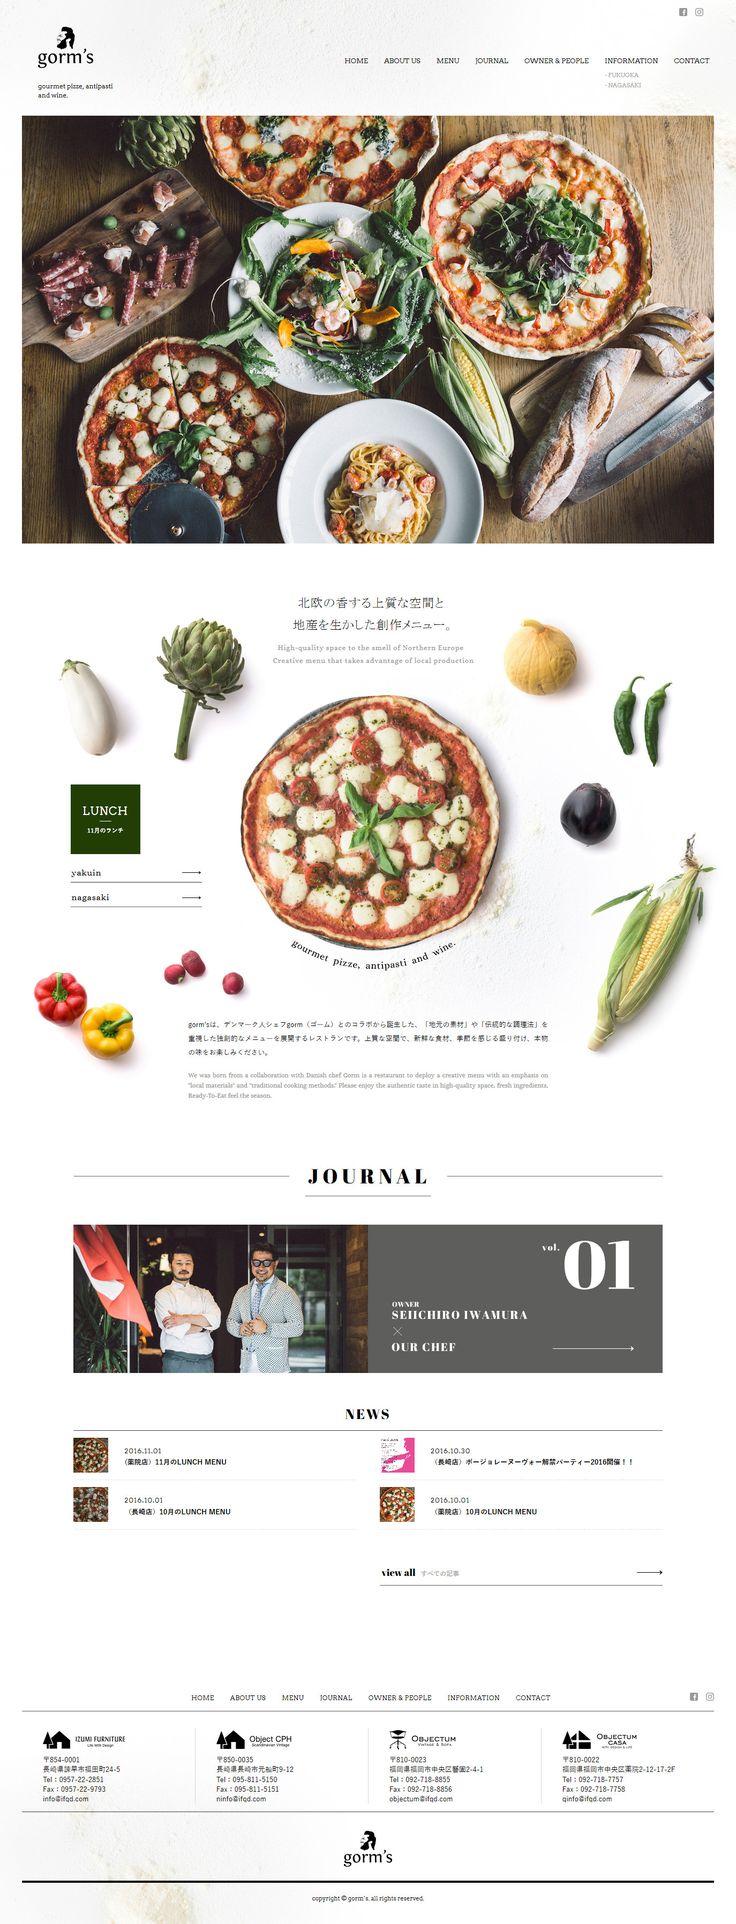 gorm's 福岡薬院・長崎のピザレストラン「ゴームス」 http://www.gorms.jp/